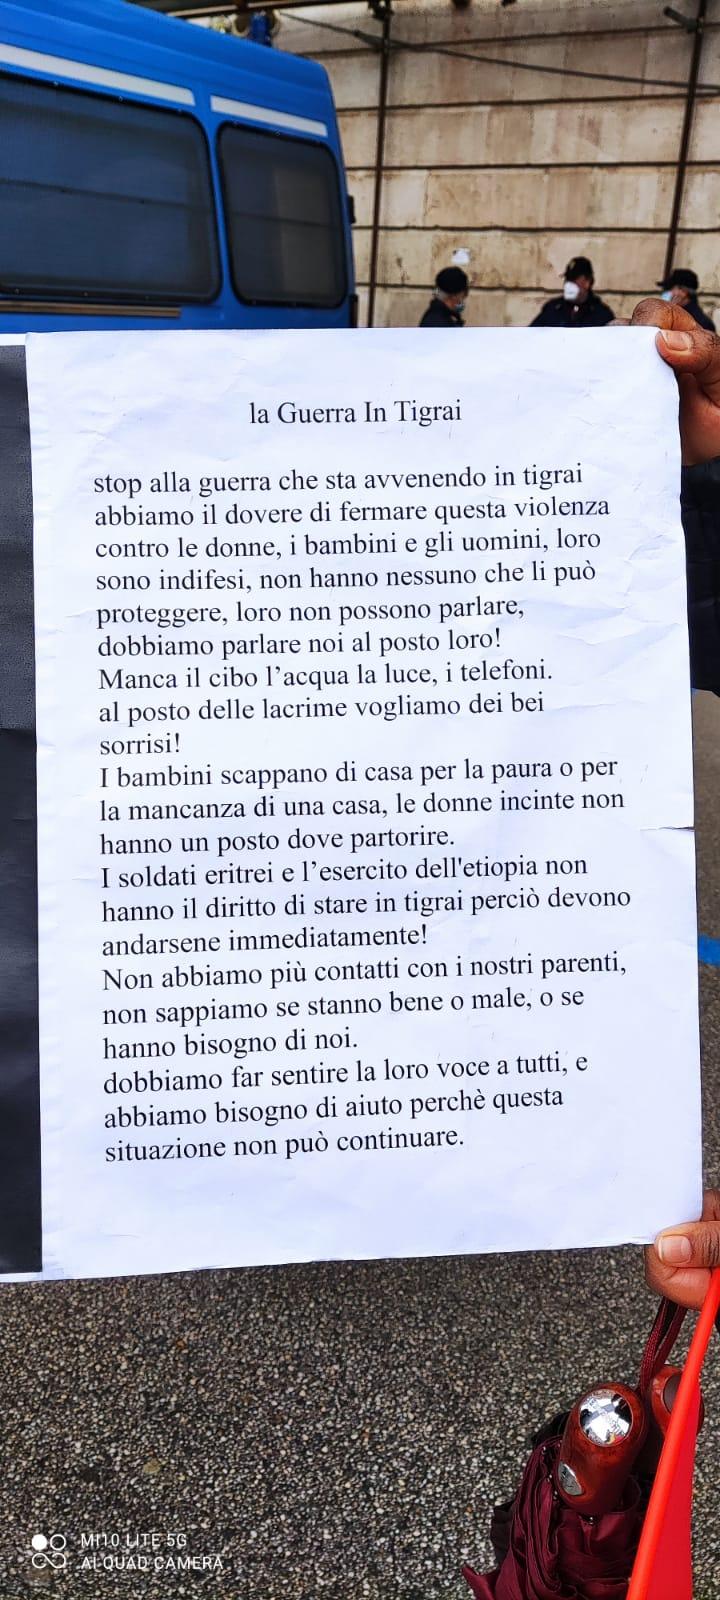 https://bari.ilquotidianoitaliano.com/wp-content/uploads/2021/01/WhatsApp-Image-2021-01-31-at-12.52.08.jpeg